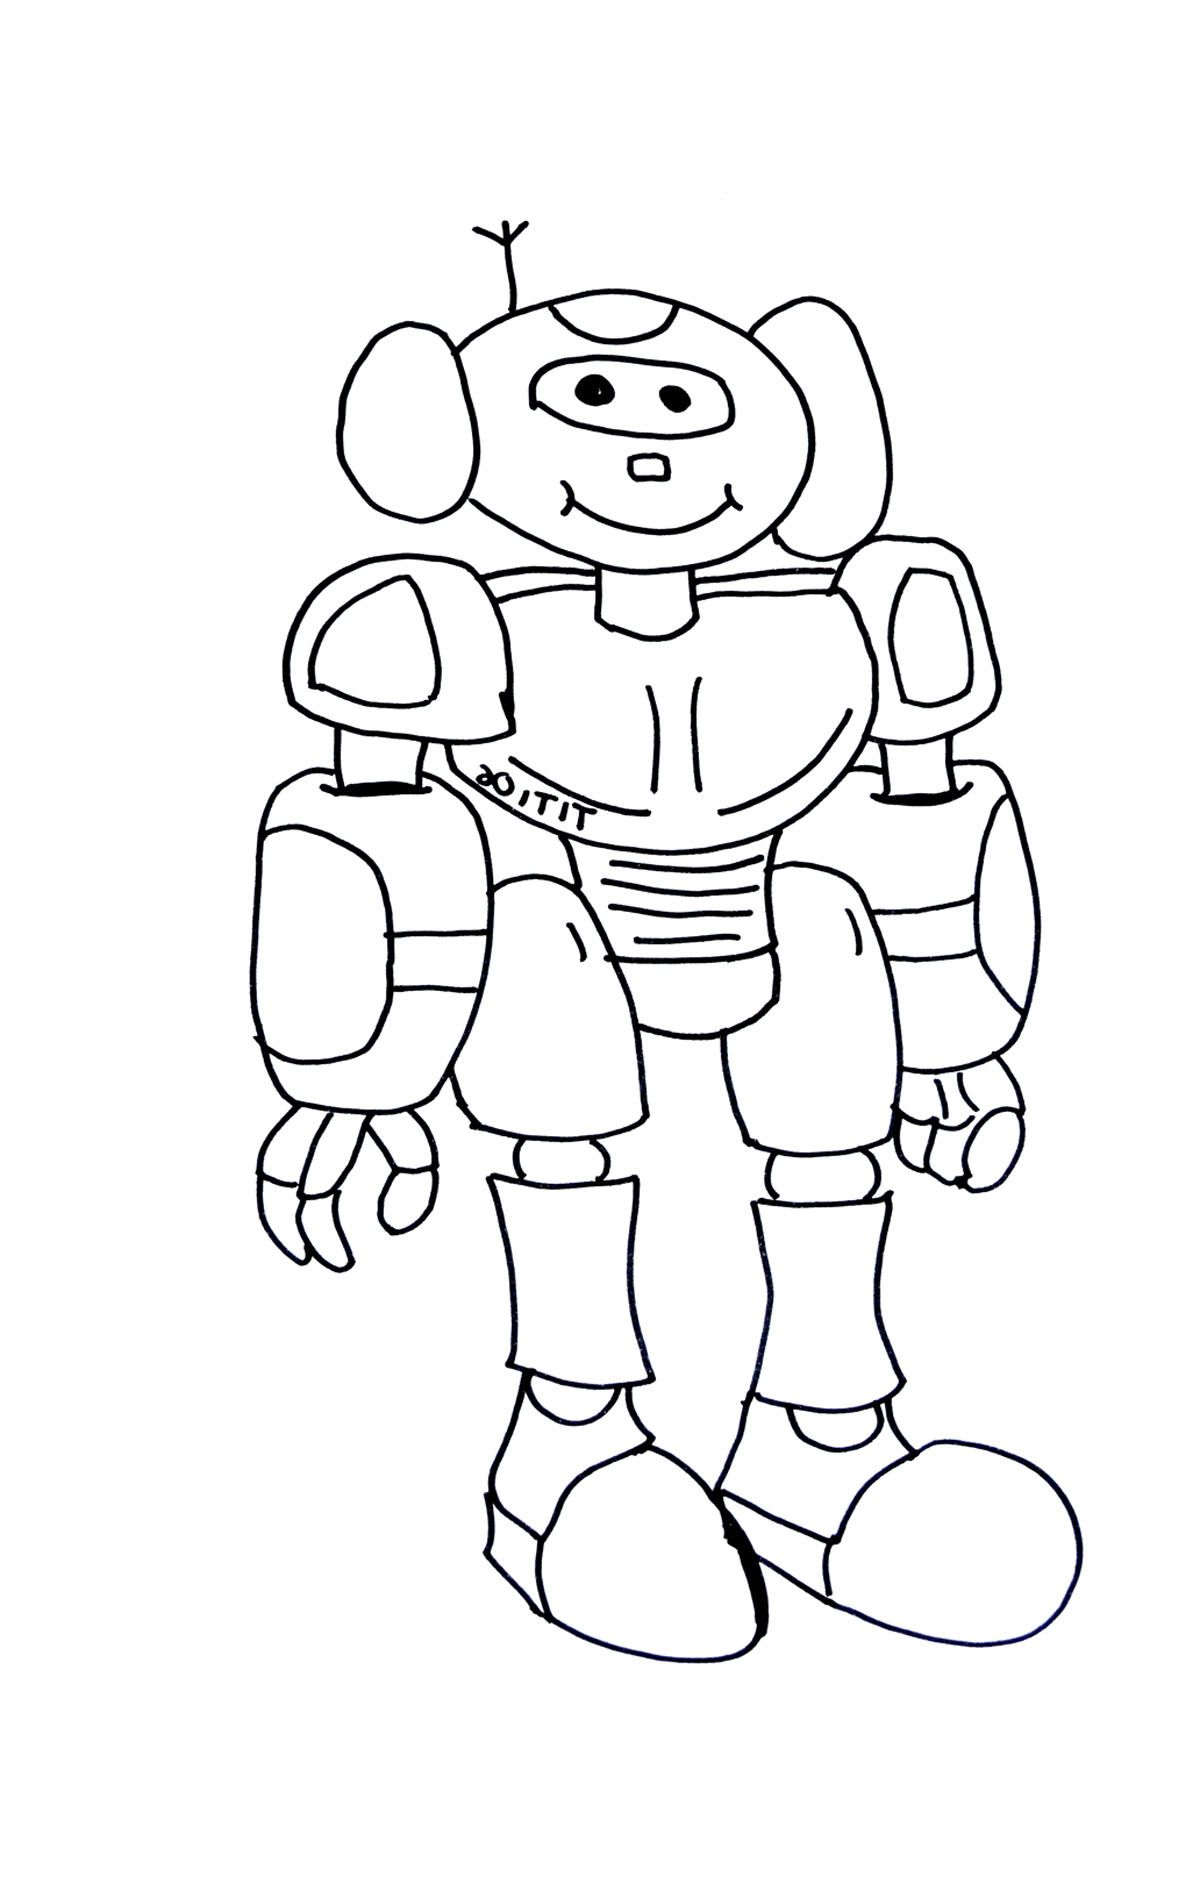 10 Precieux Coloriage Robot A Imprimer Gallery Coloriage Robot Coloriage Coloriage A Imprimer